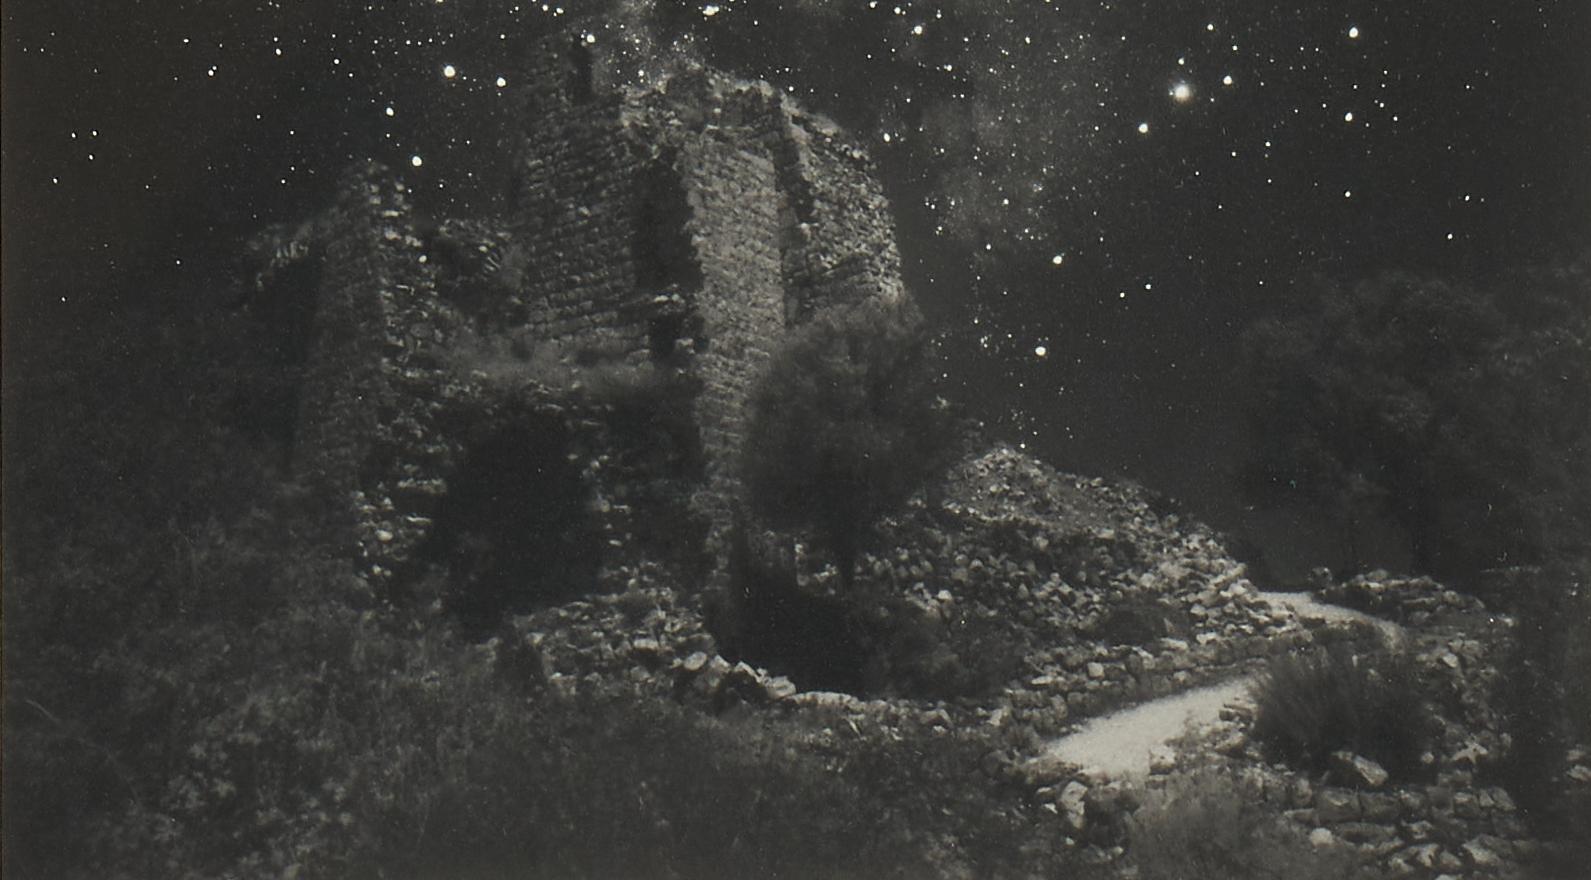 Lot 522: Neil Folberg Photograph, Scorpius Milky Way Rising, plus G. Colbert Book